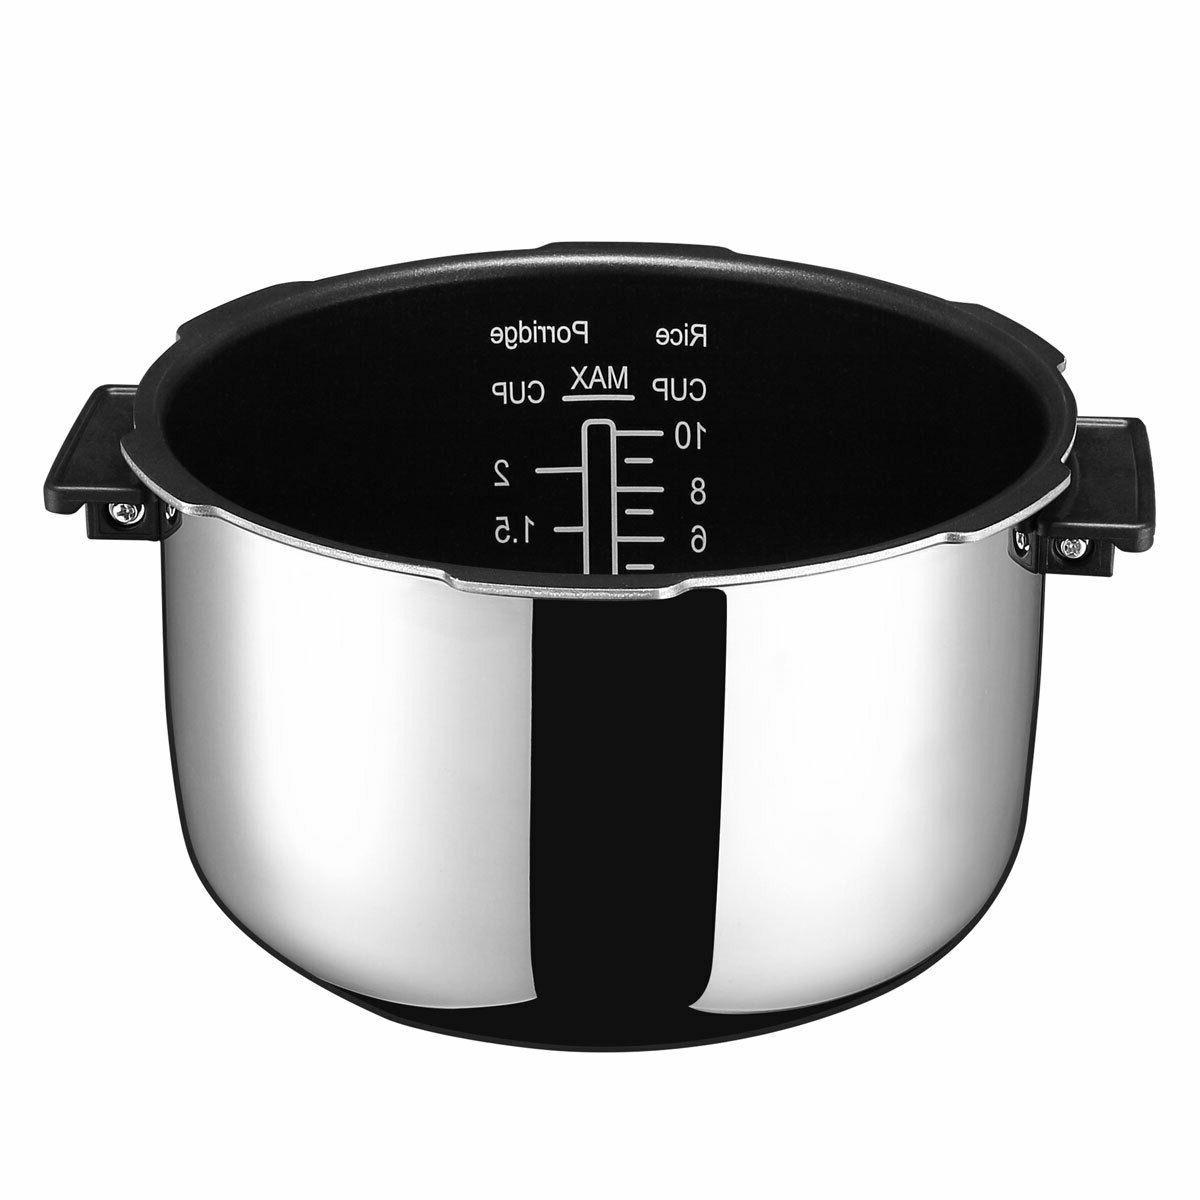 Housmile IH Pressure Rice & Cooker 1000w